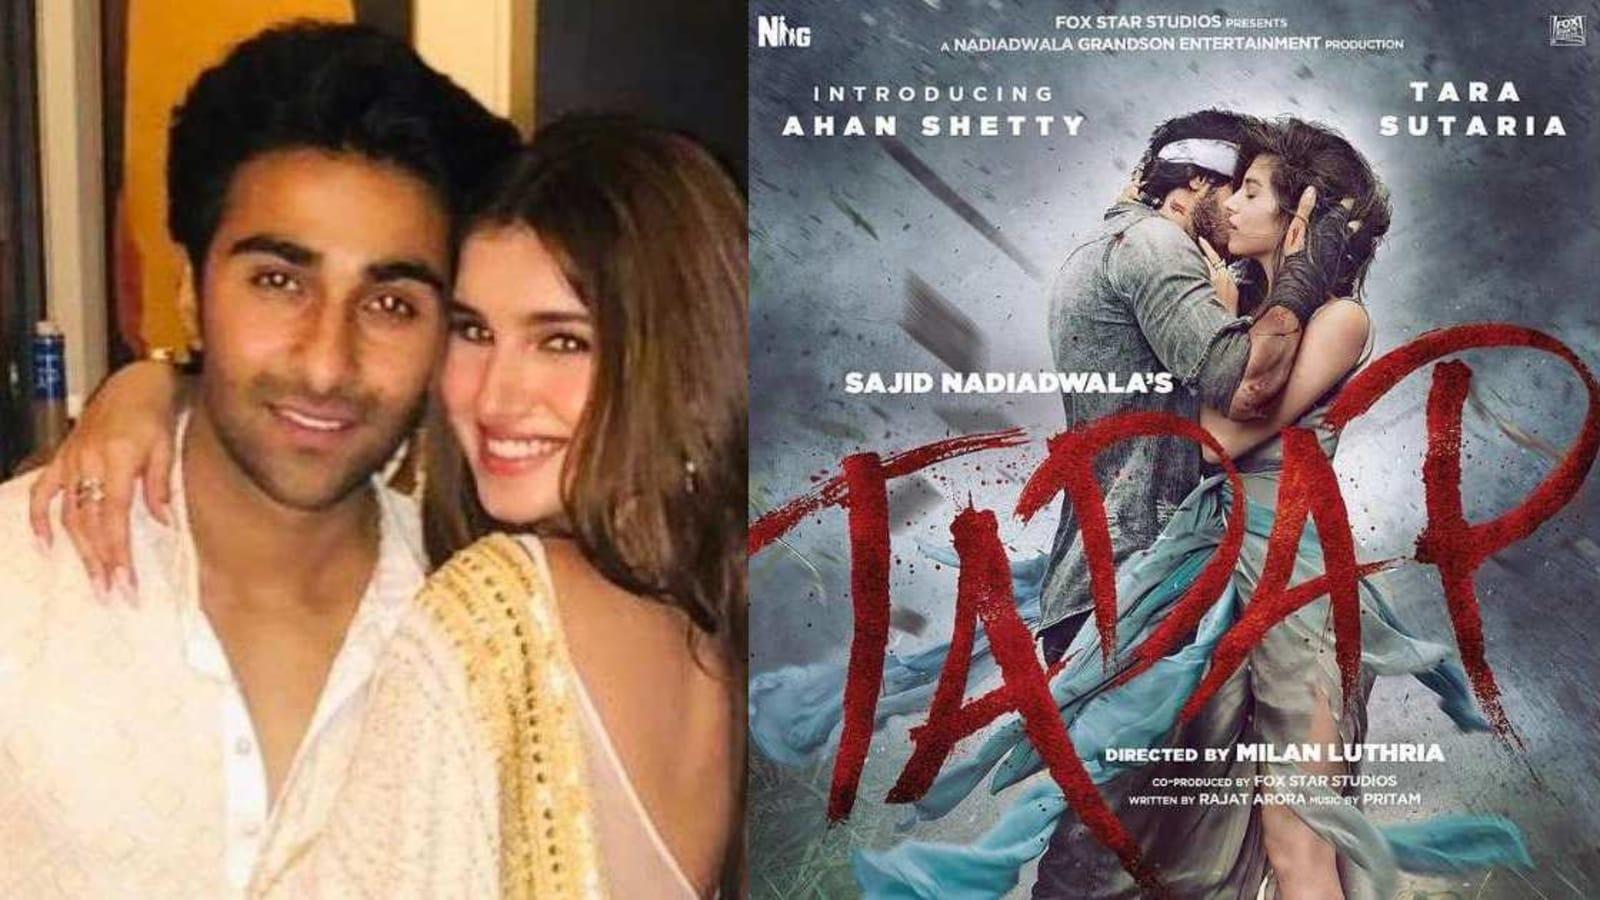 Tara Sutaria showers boyfriend Aadar Jain with love as he hypes up Tadap: 'My whole heart' - Hindustan Times